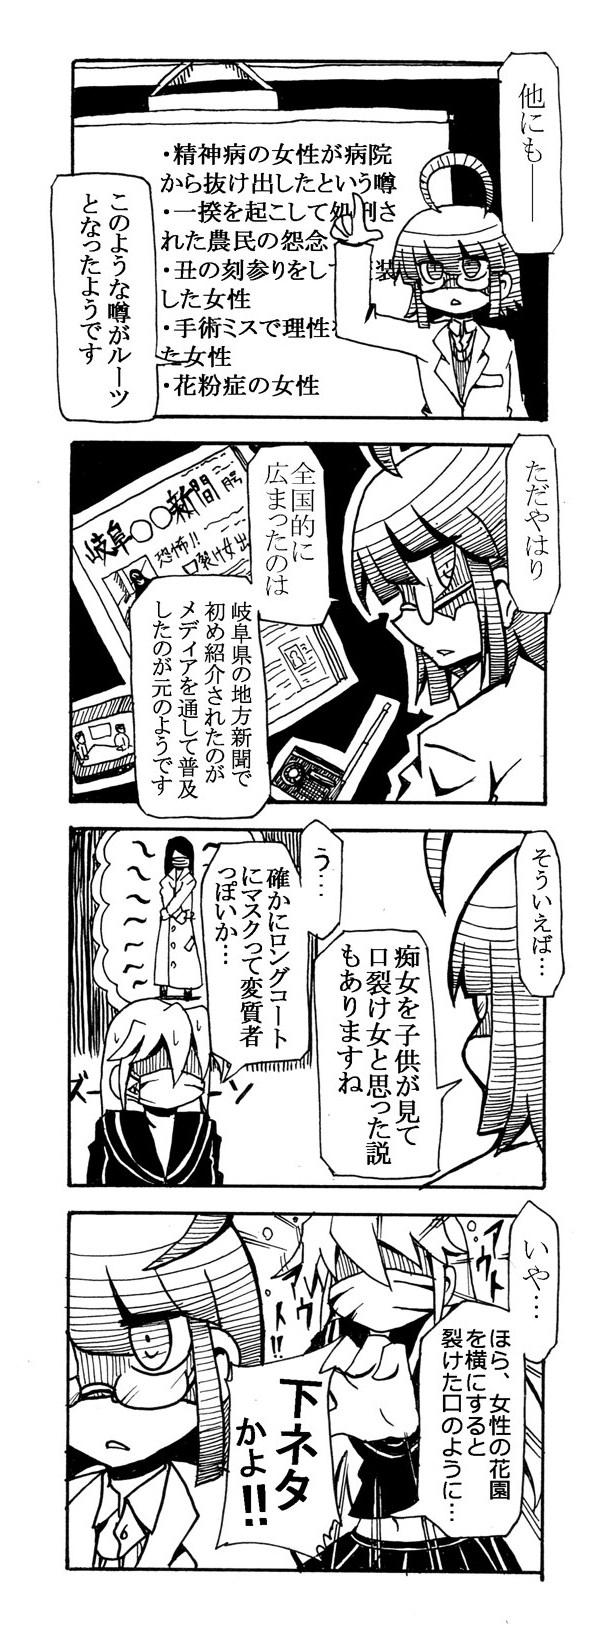 hanako11.jpg